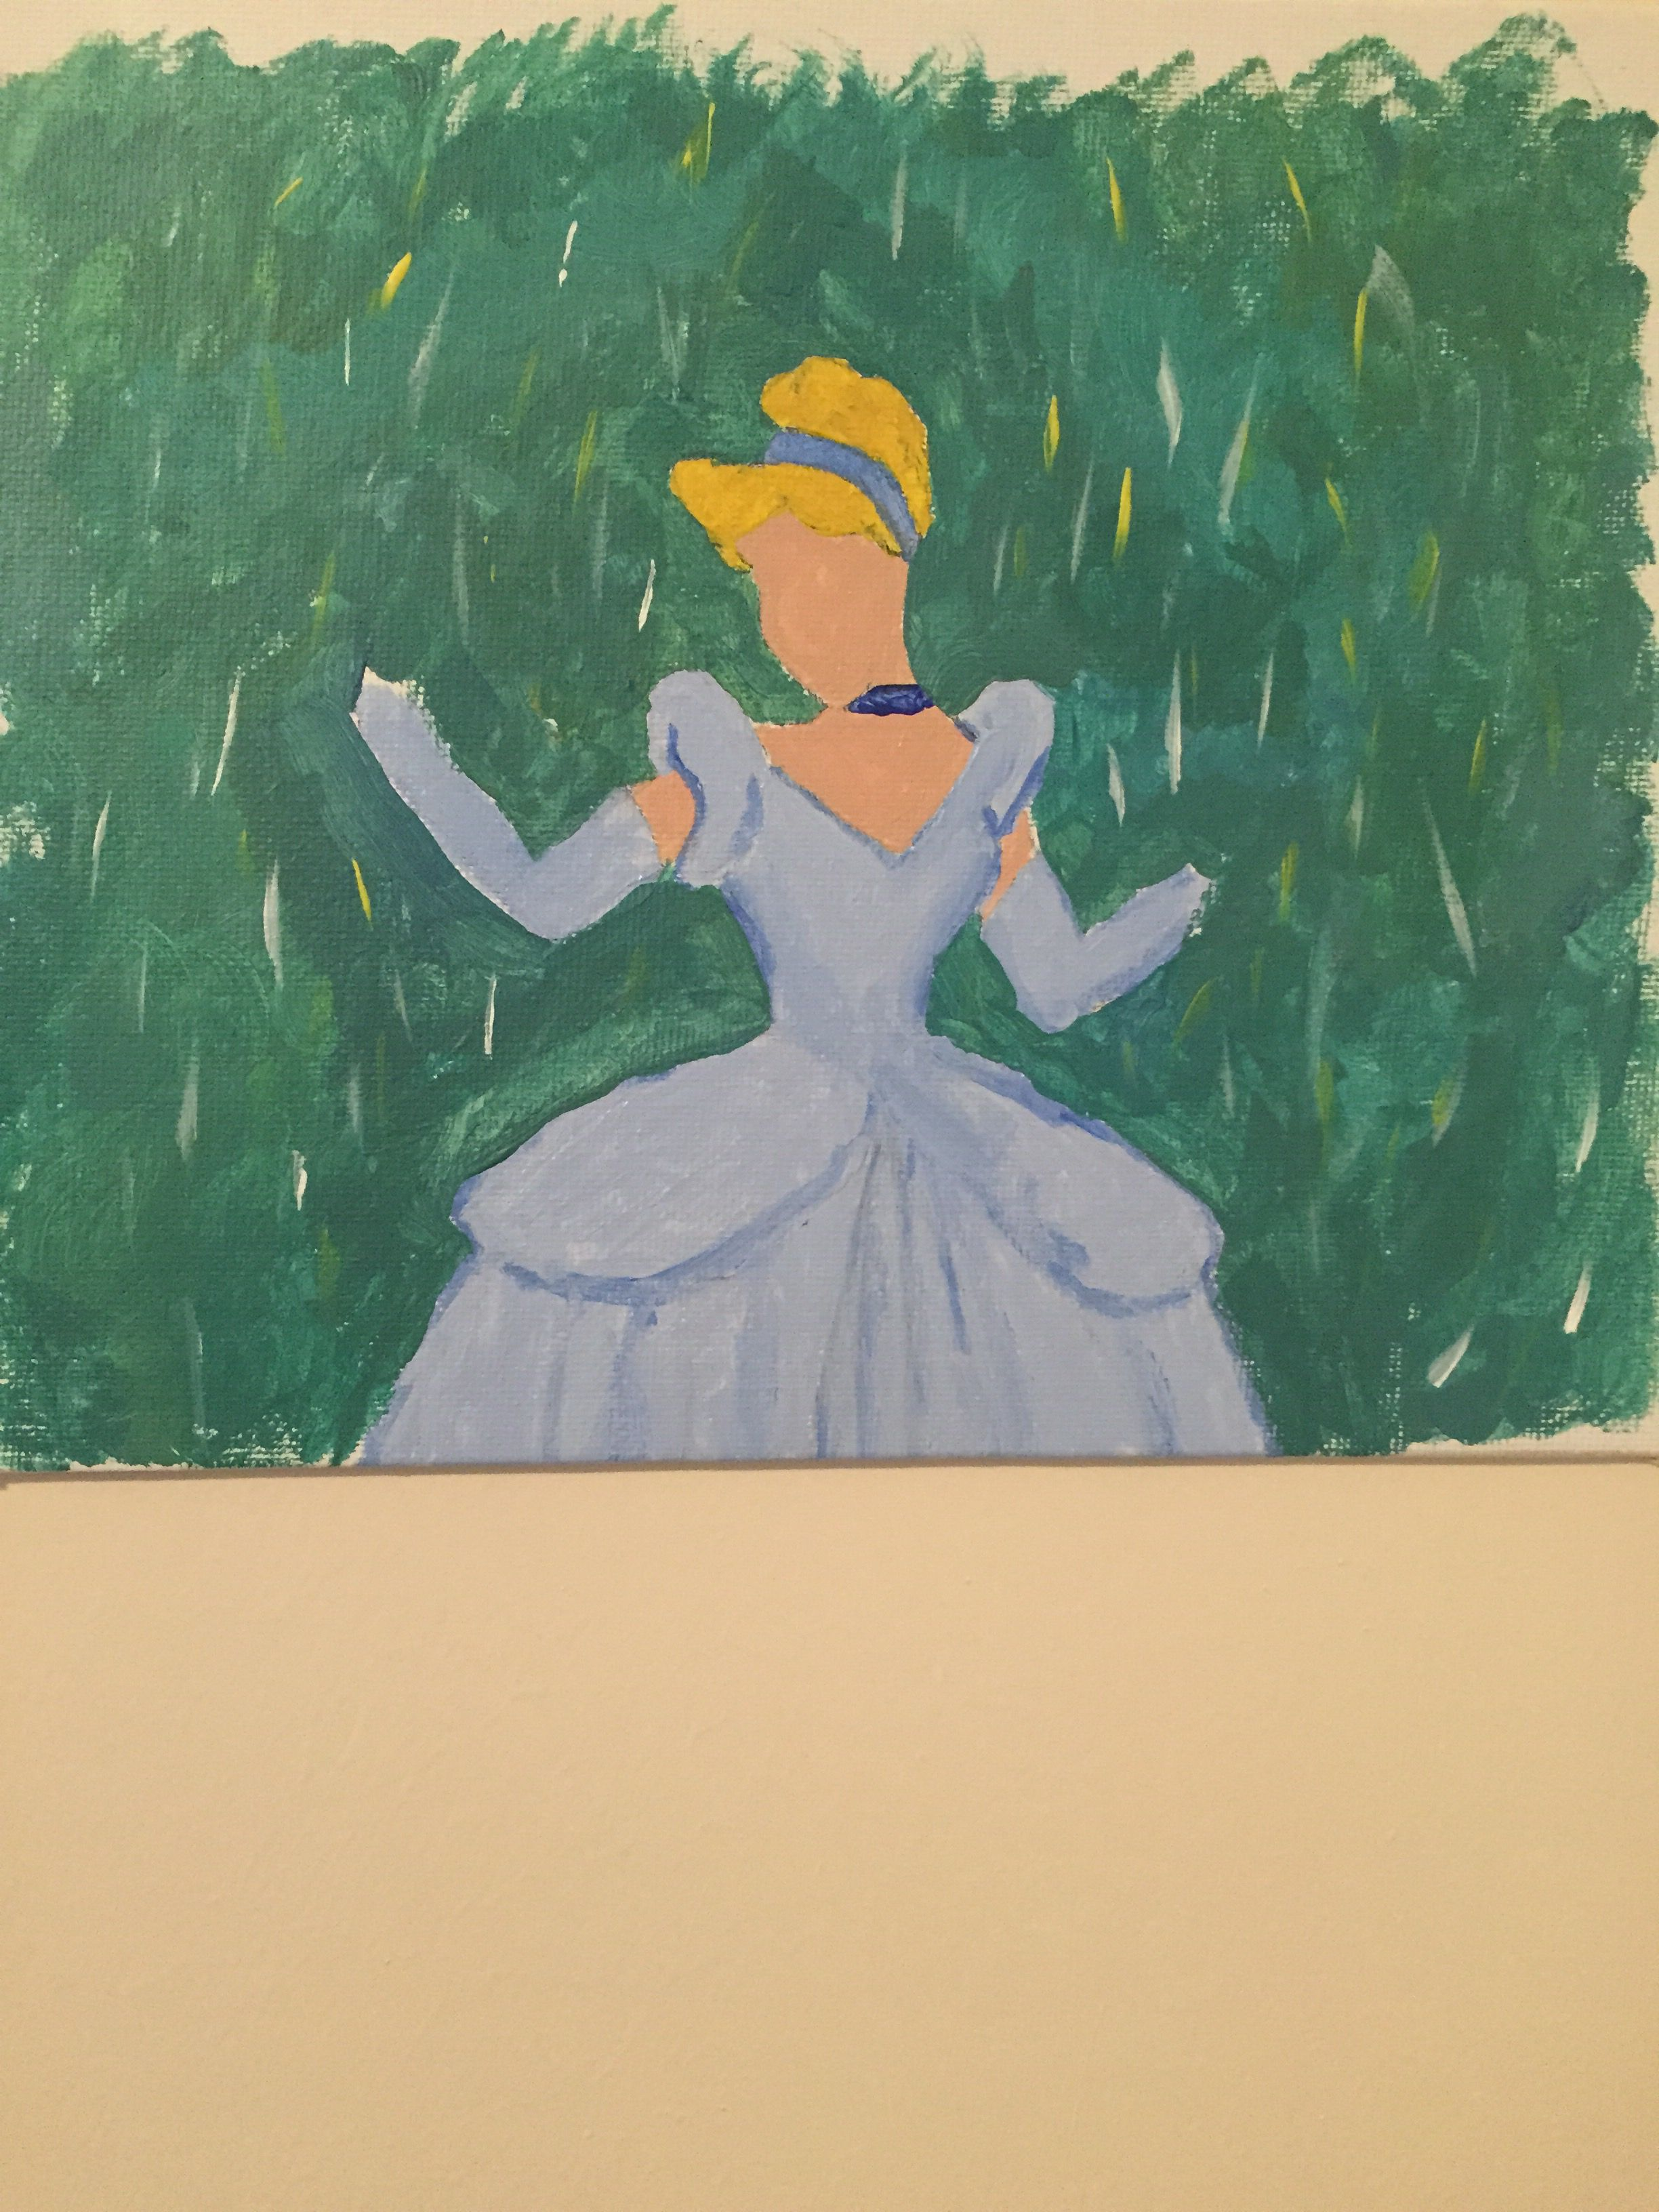 Cinderella painting